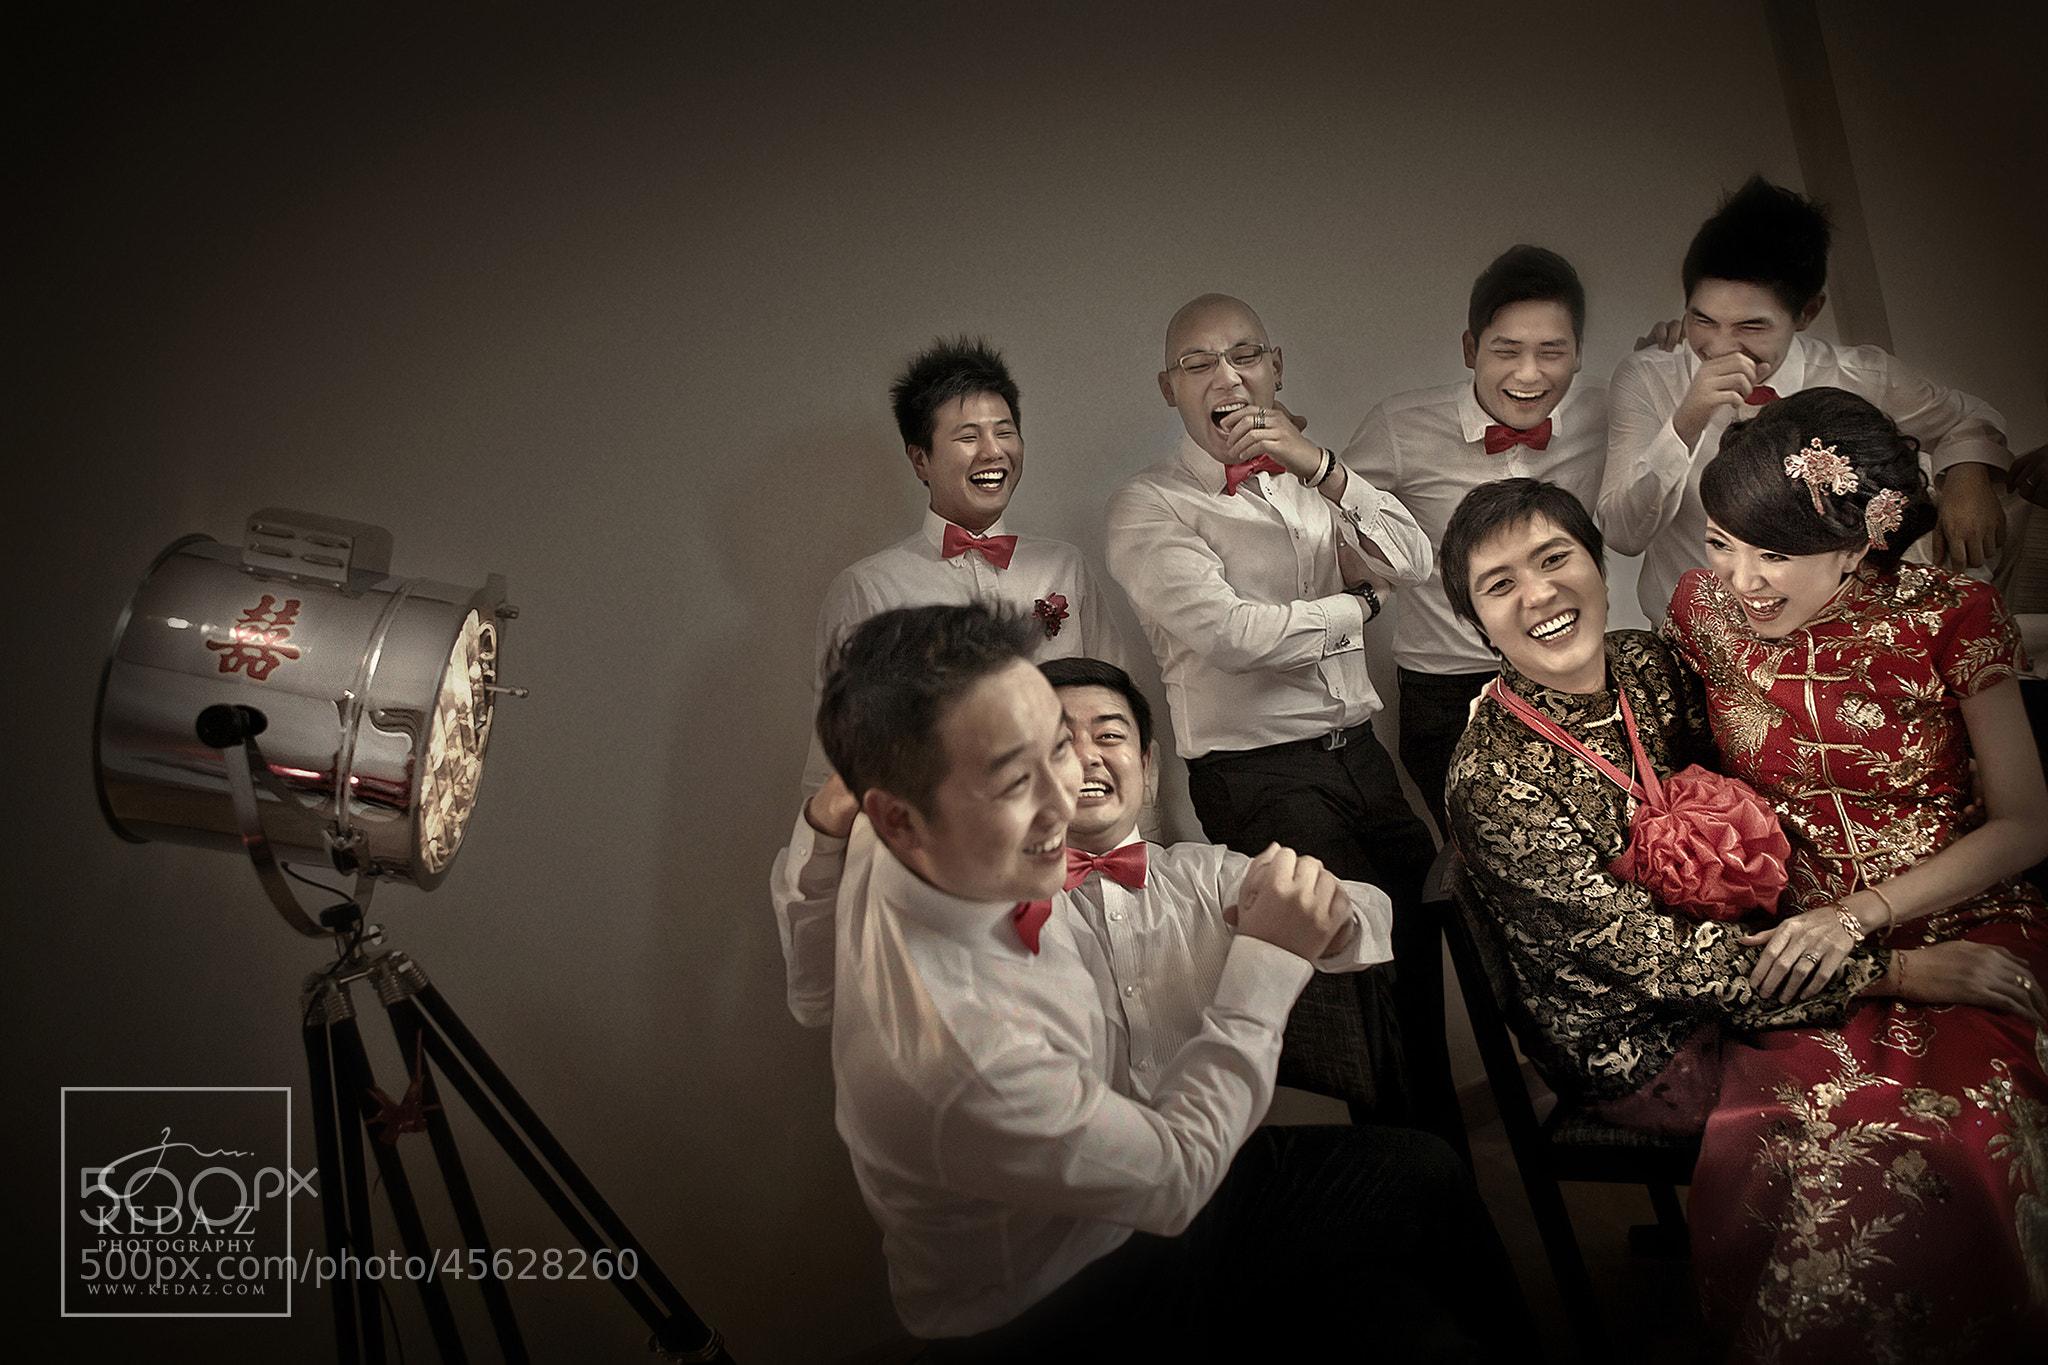 Photograph Fun Wedding by Keda.Z Feng on 500px